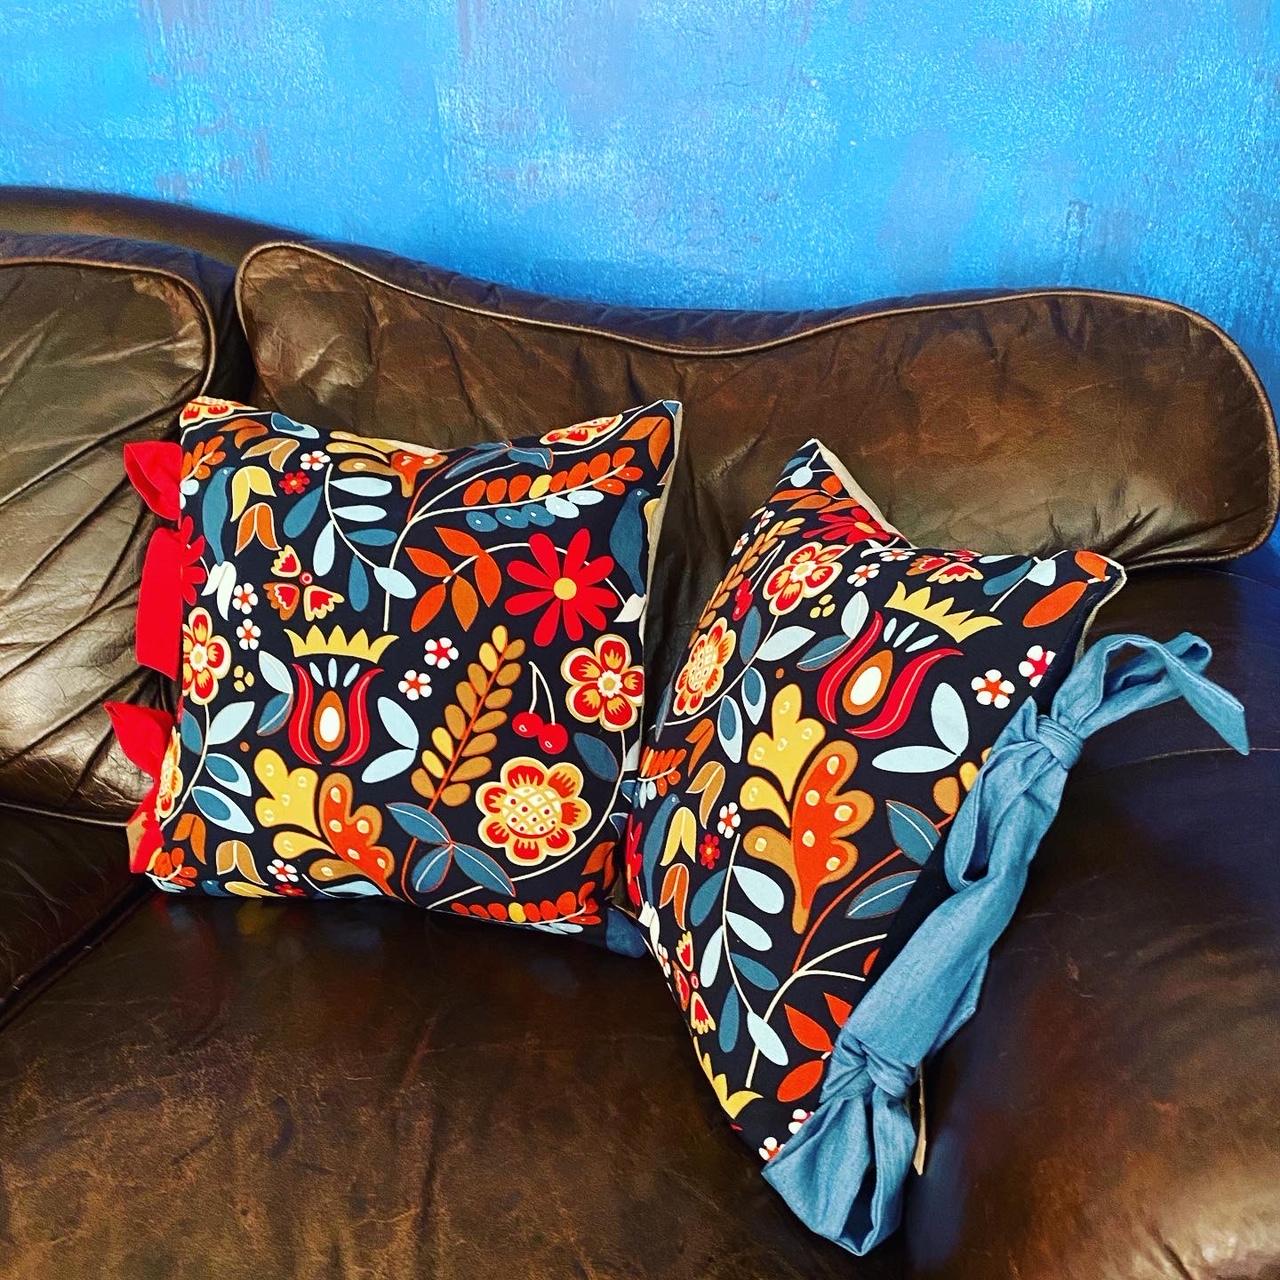 Bogi Studio - Pillows